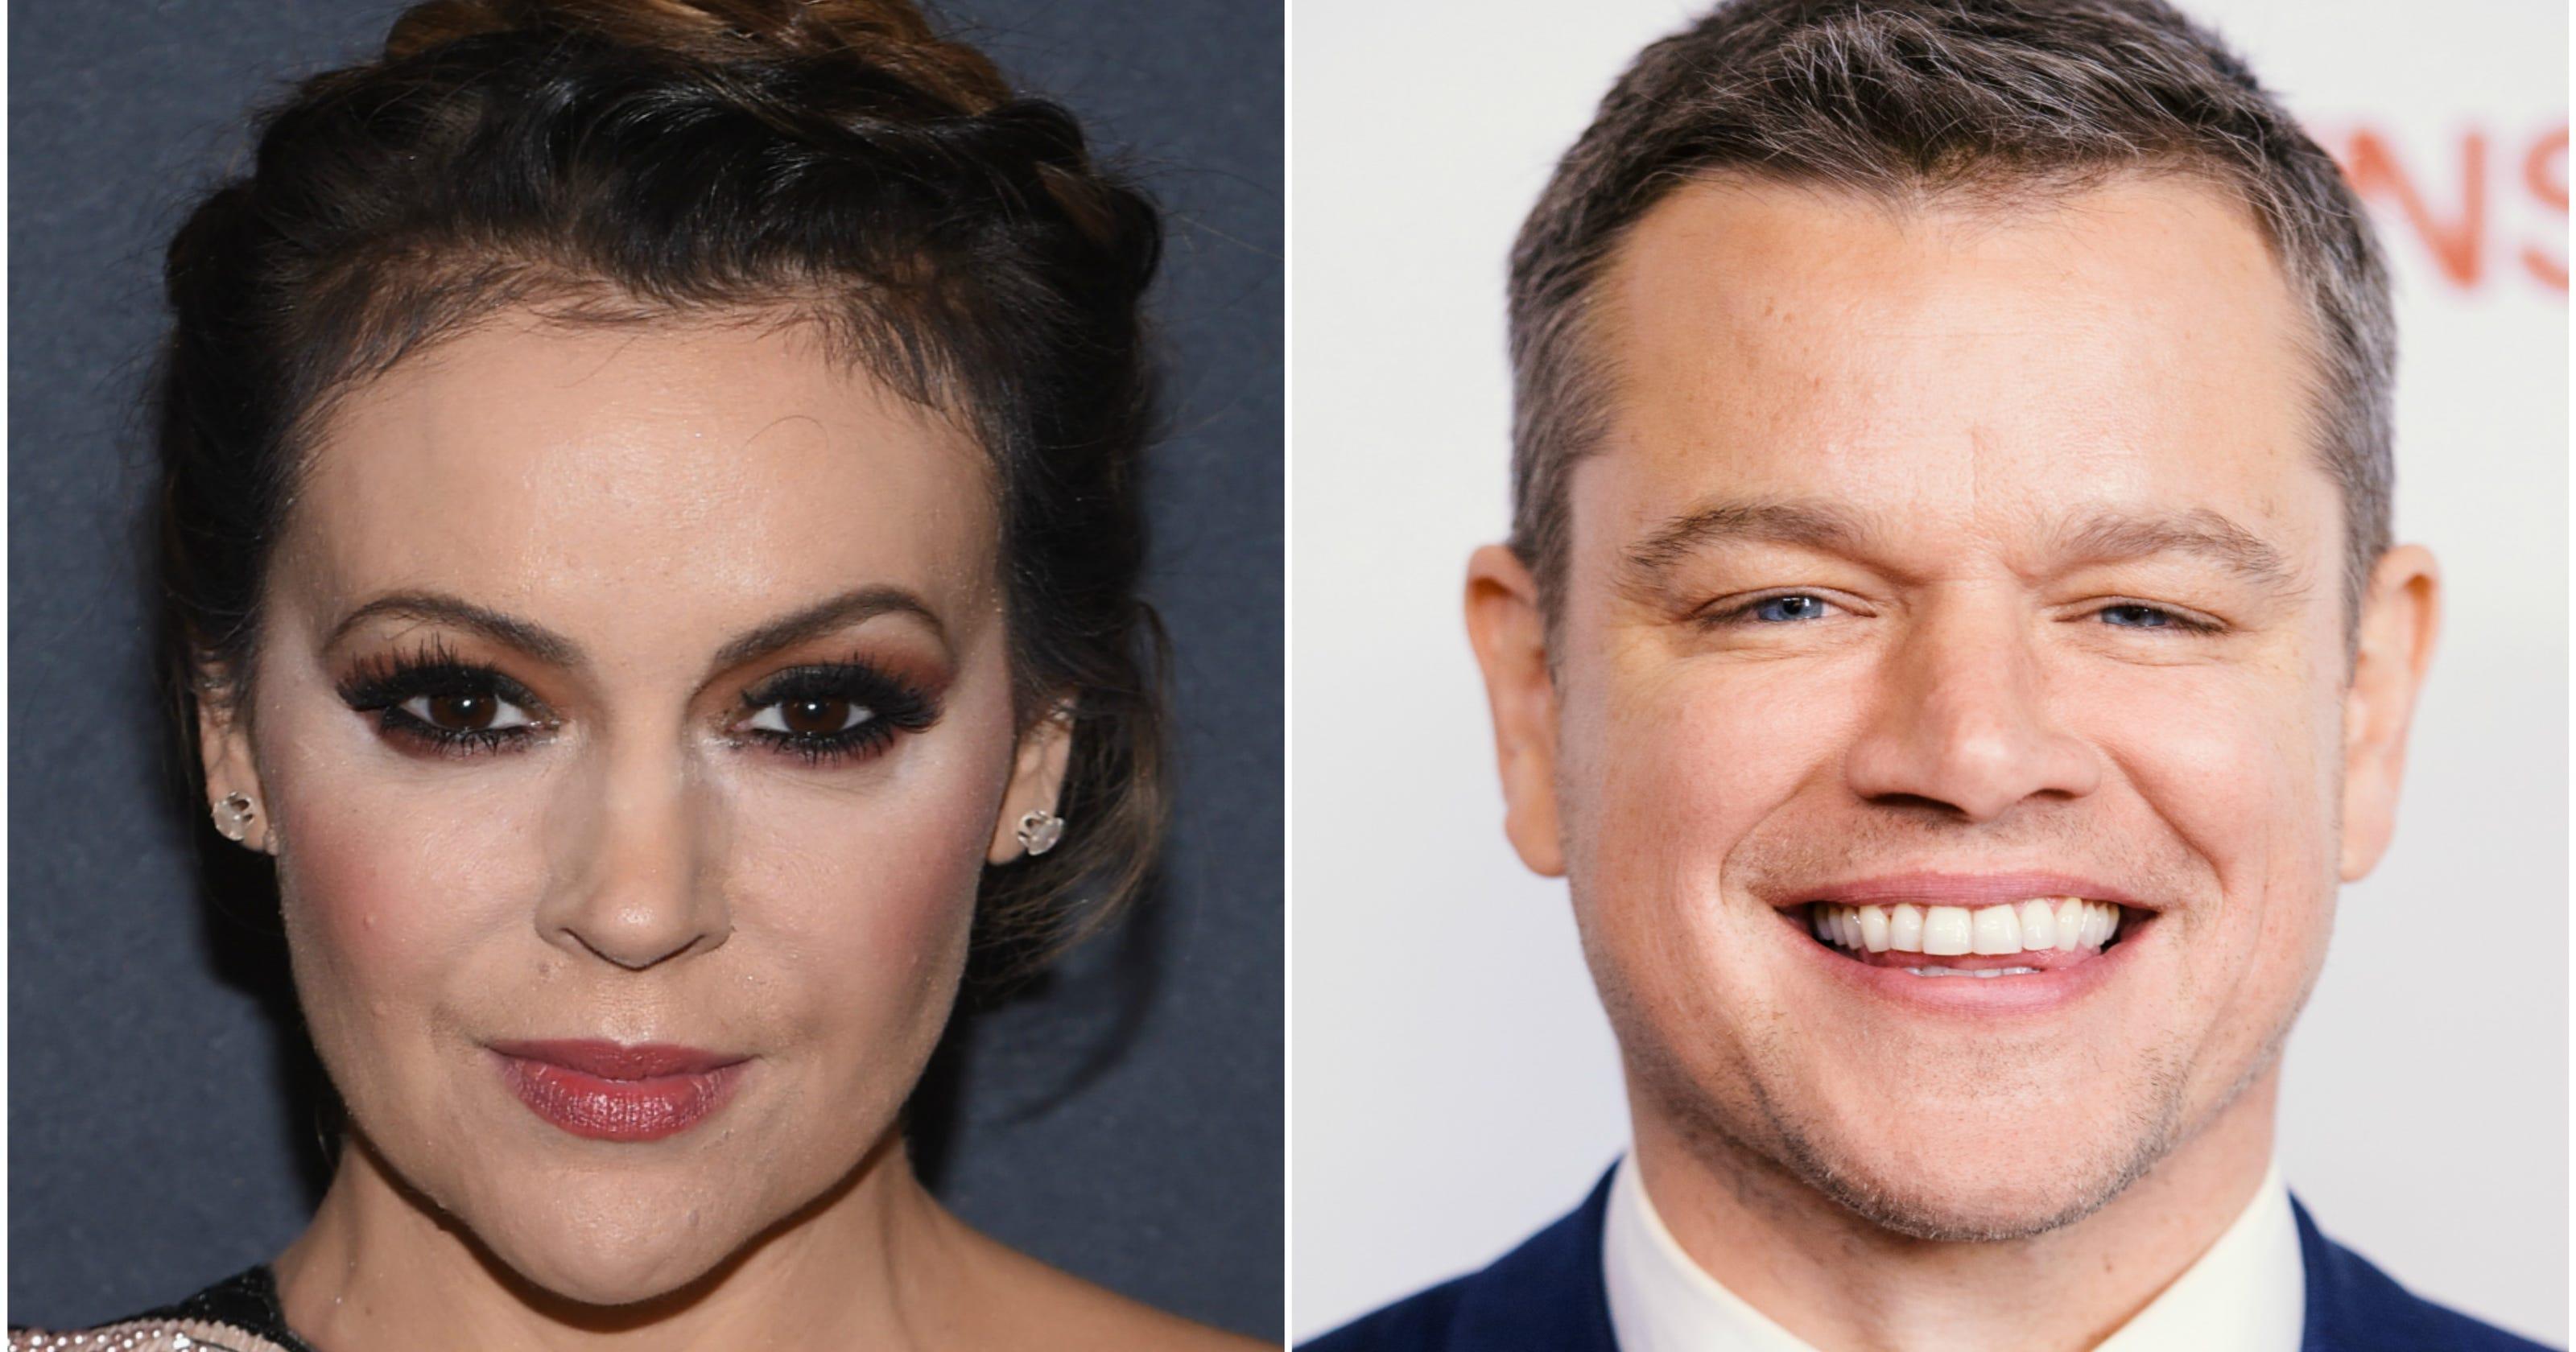 Alyssa Milano Sex Caption - Alyssa Milano shuts down Matt Damon's sexual harassment comments